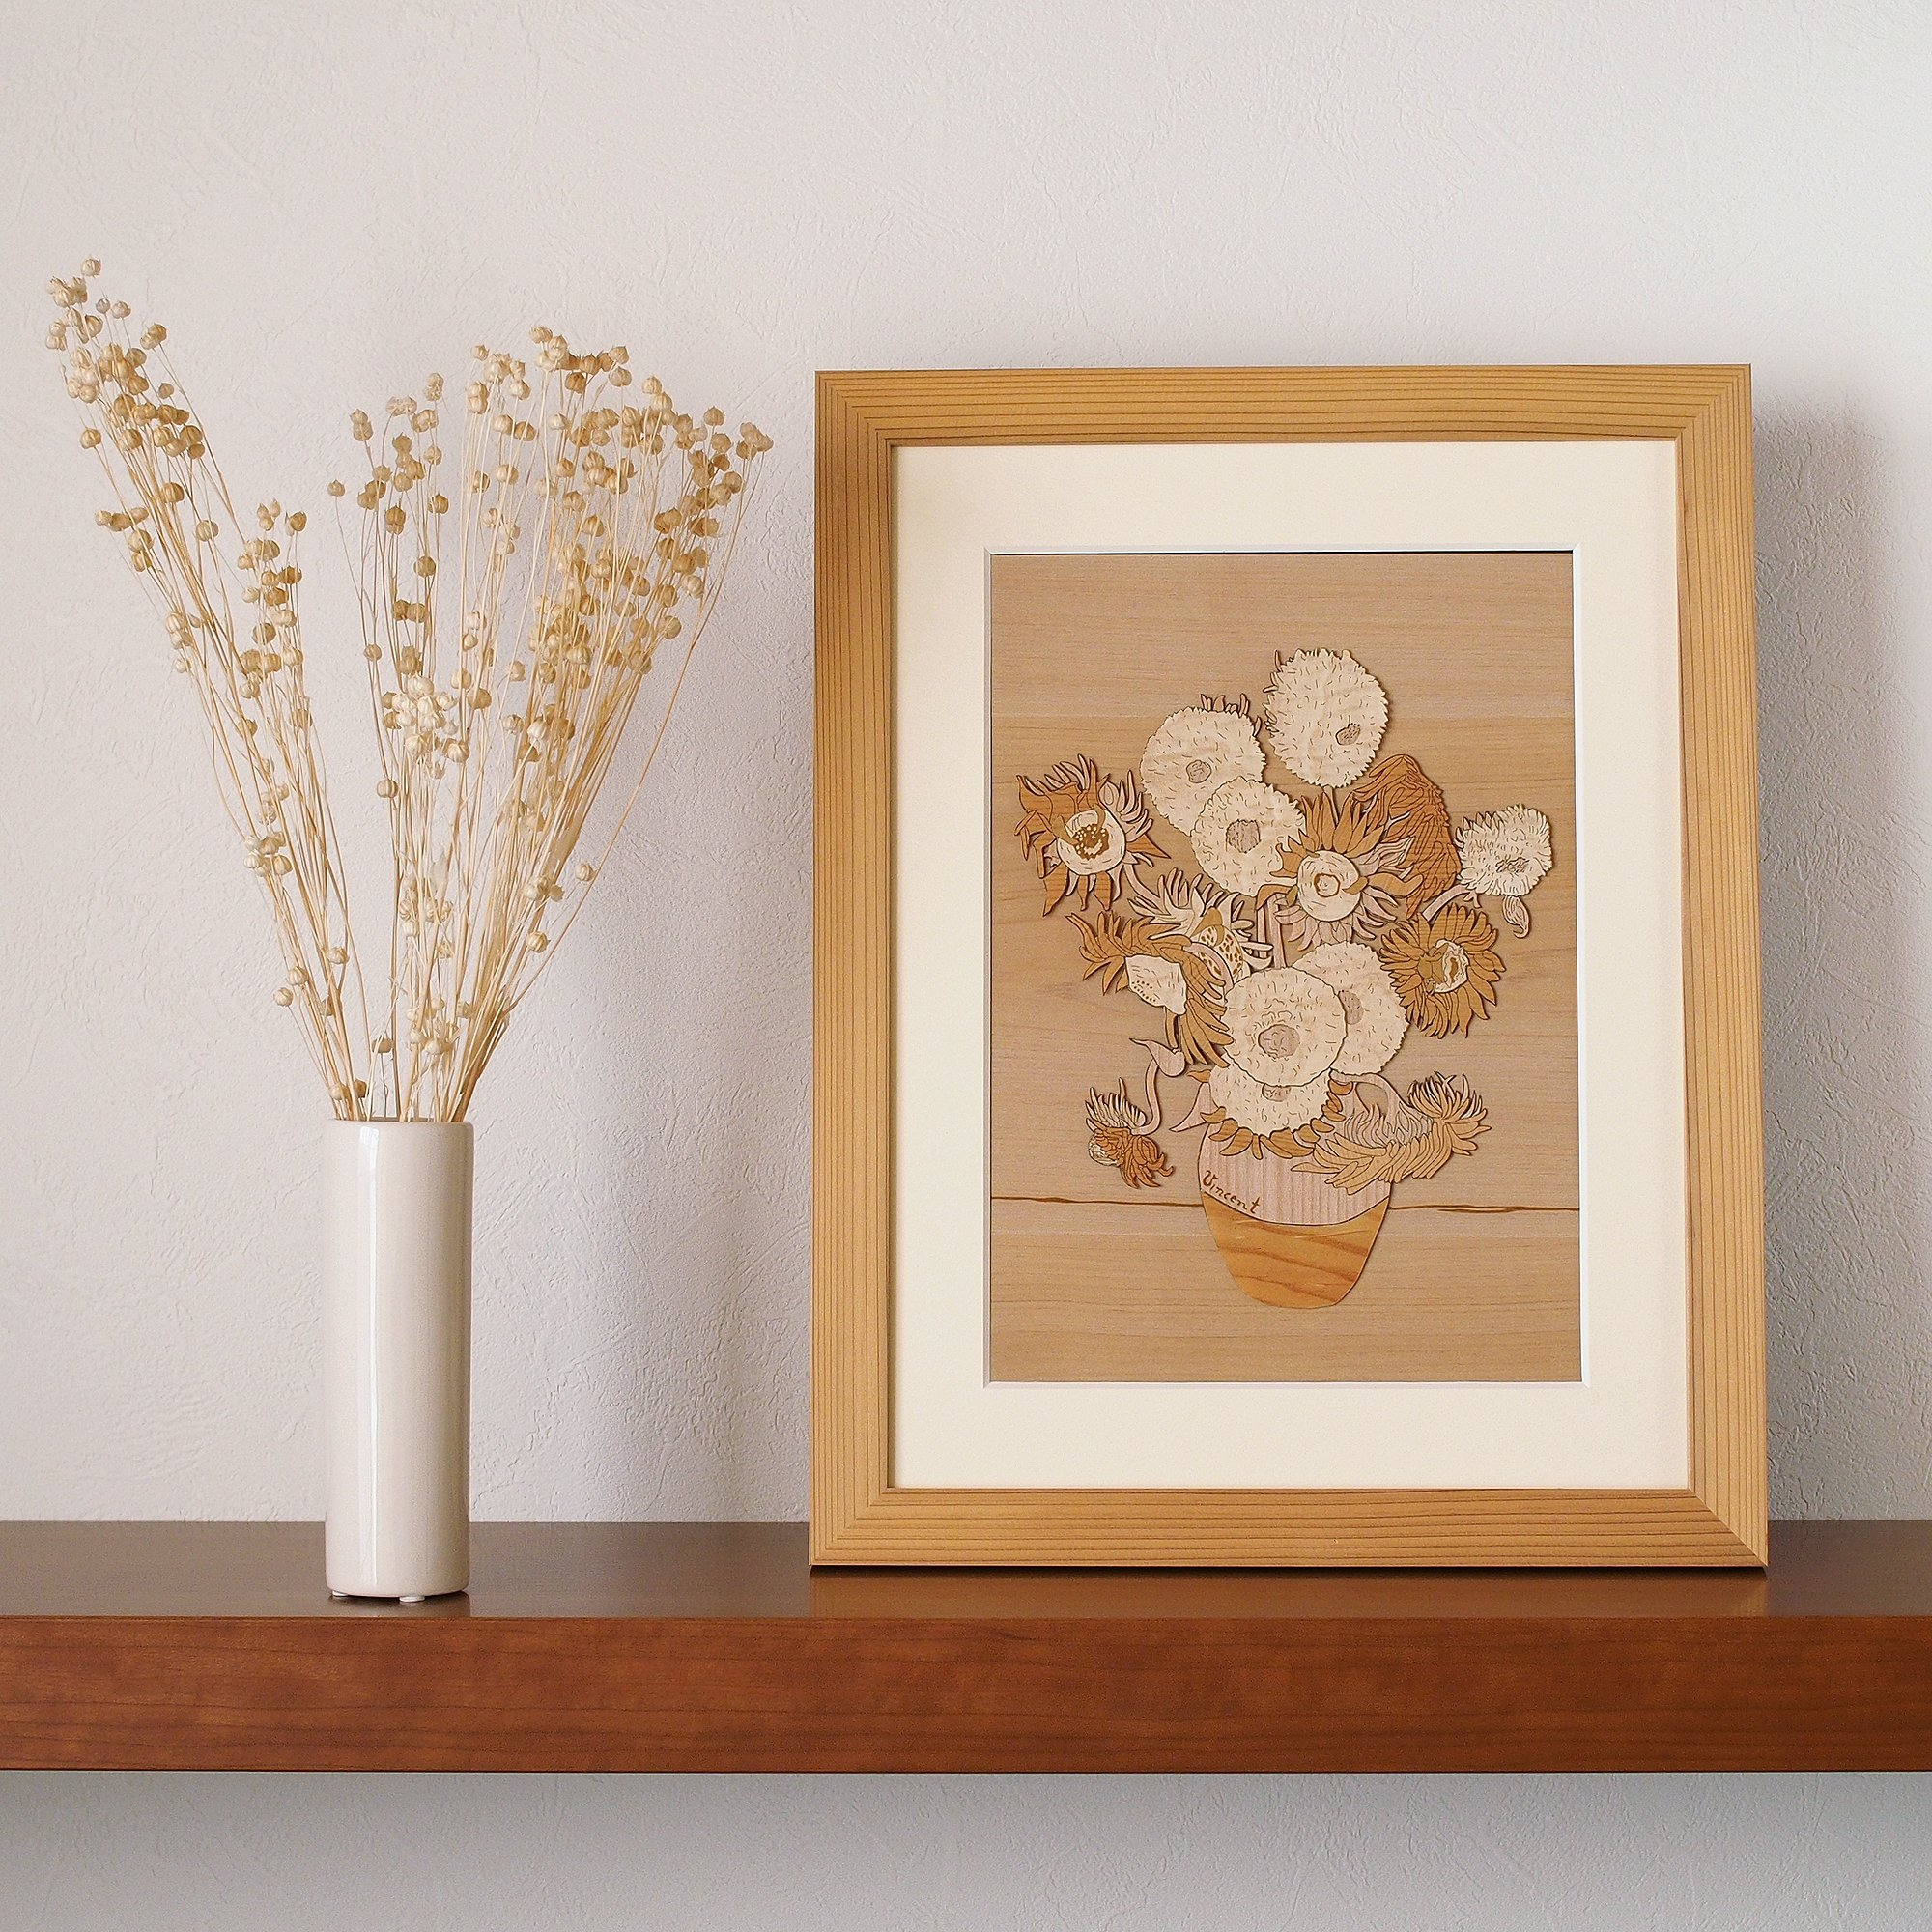 KINOWA Wooden Art Kit Kiharie Sunflowers Made in Japan by KINOWA (Image #6)